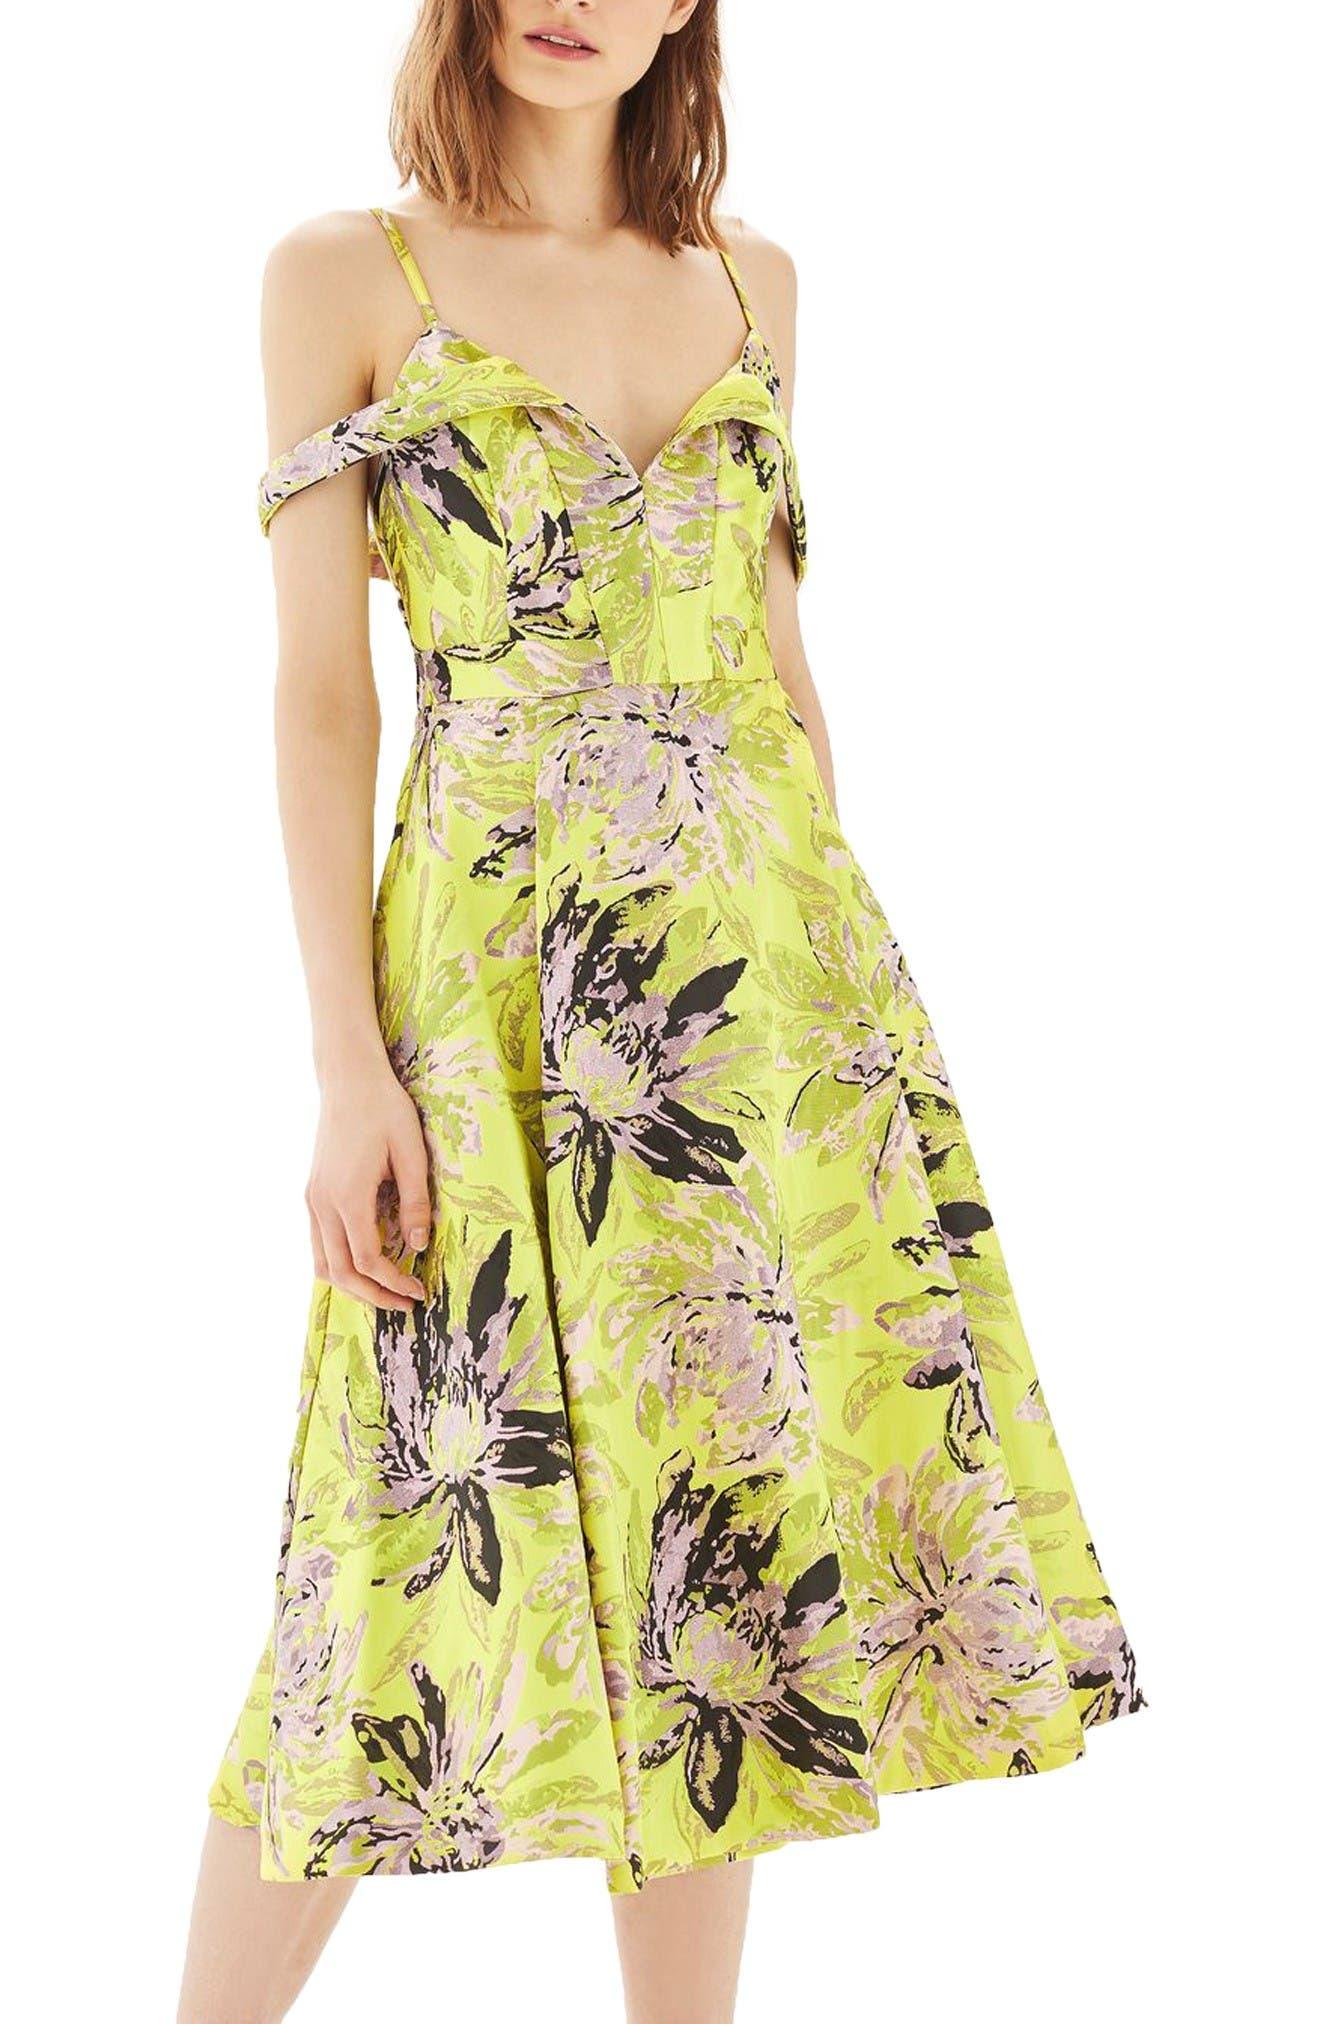 Alternate Image 1 Selected - Topshop Floral Jacquard Midi Dress